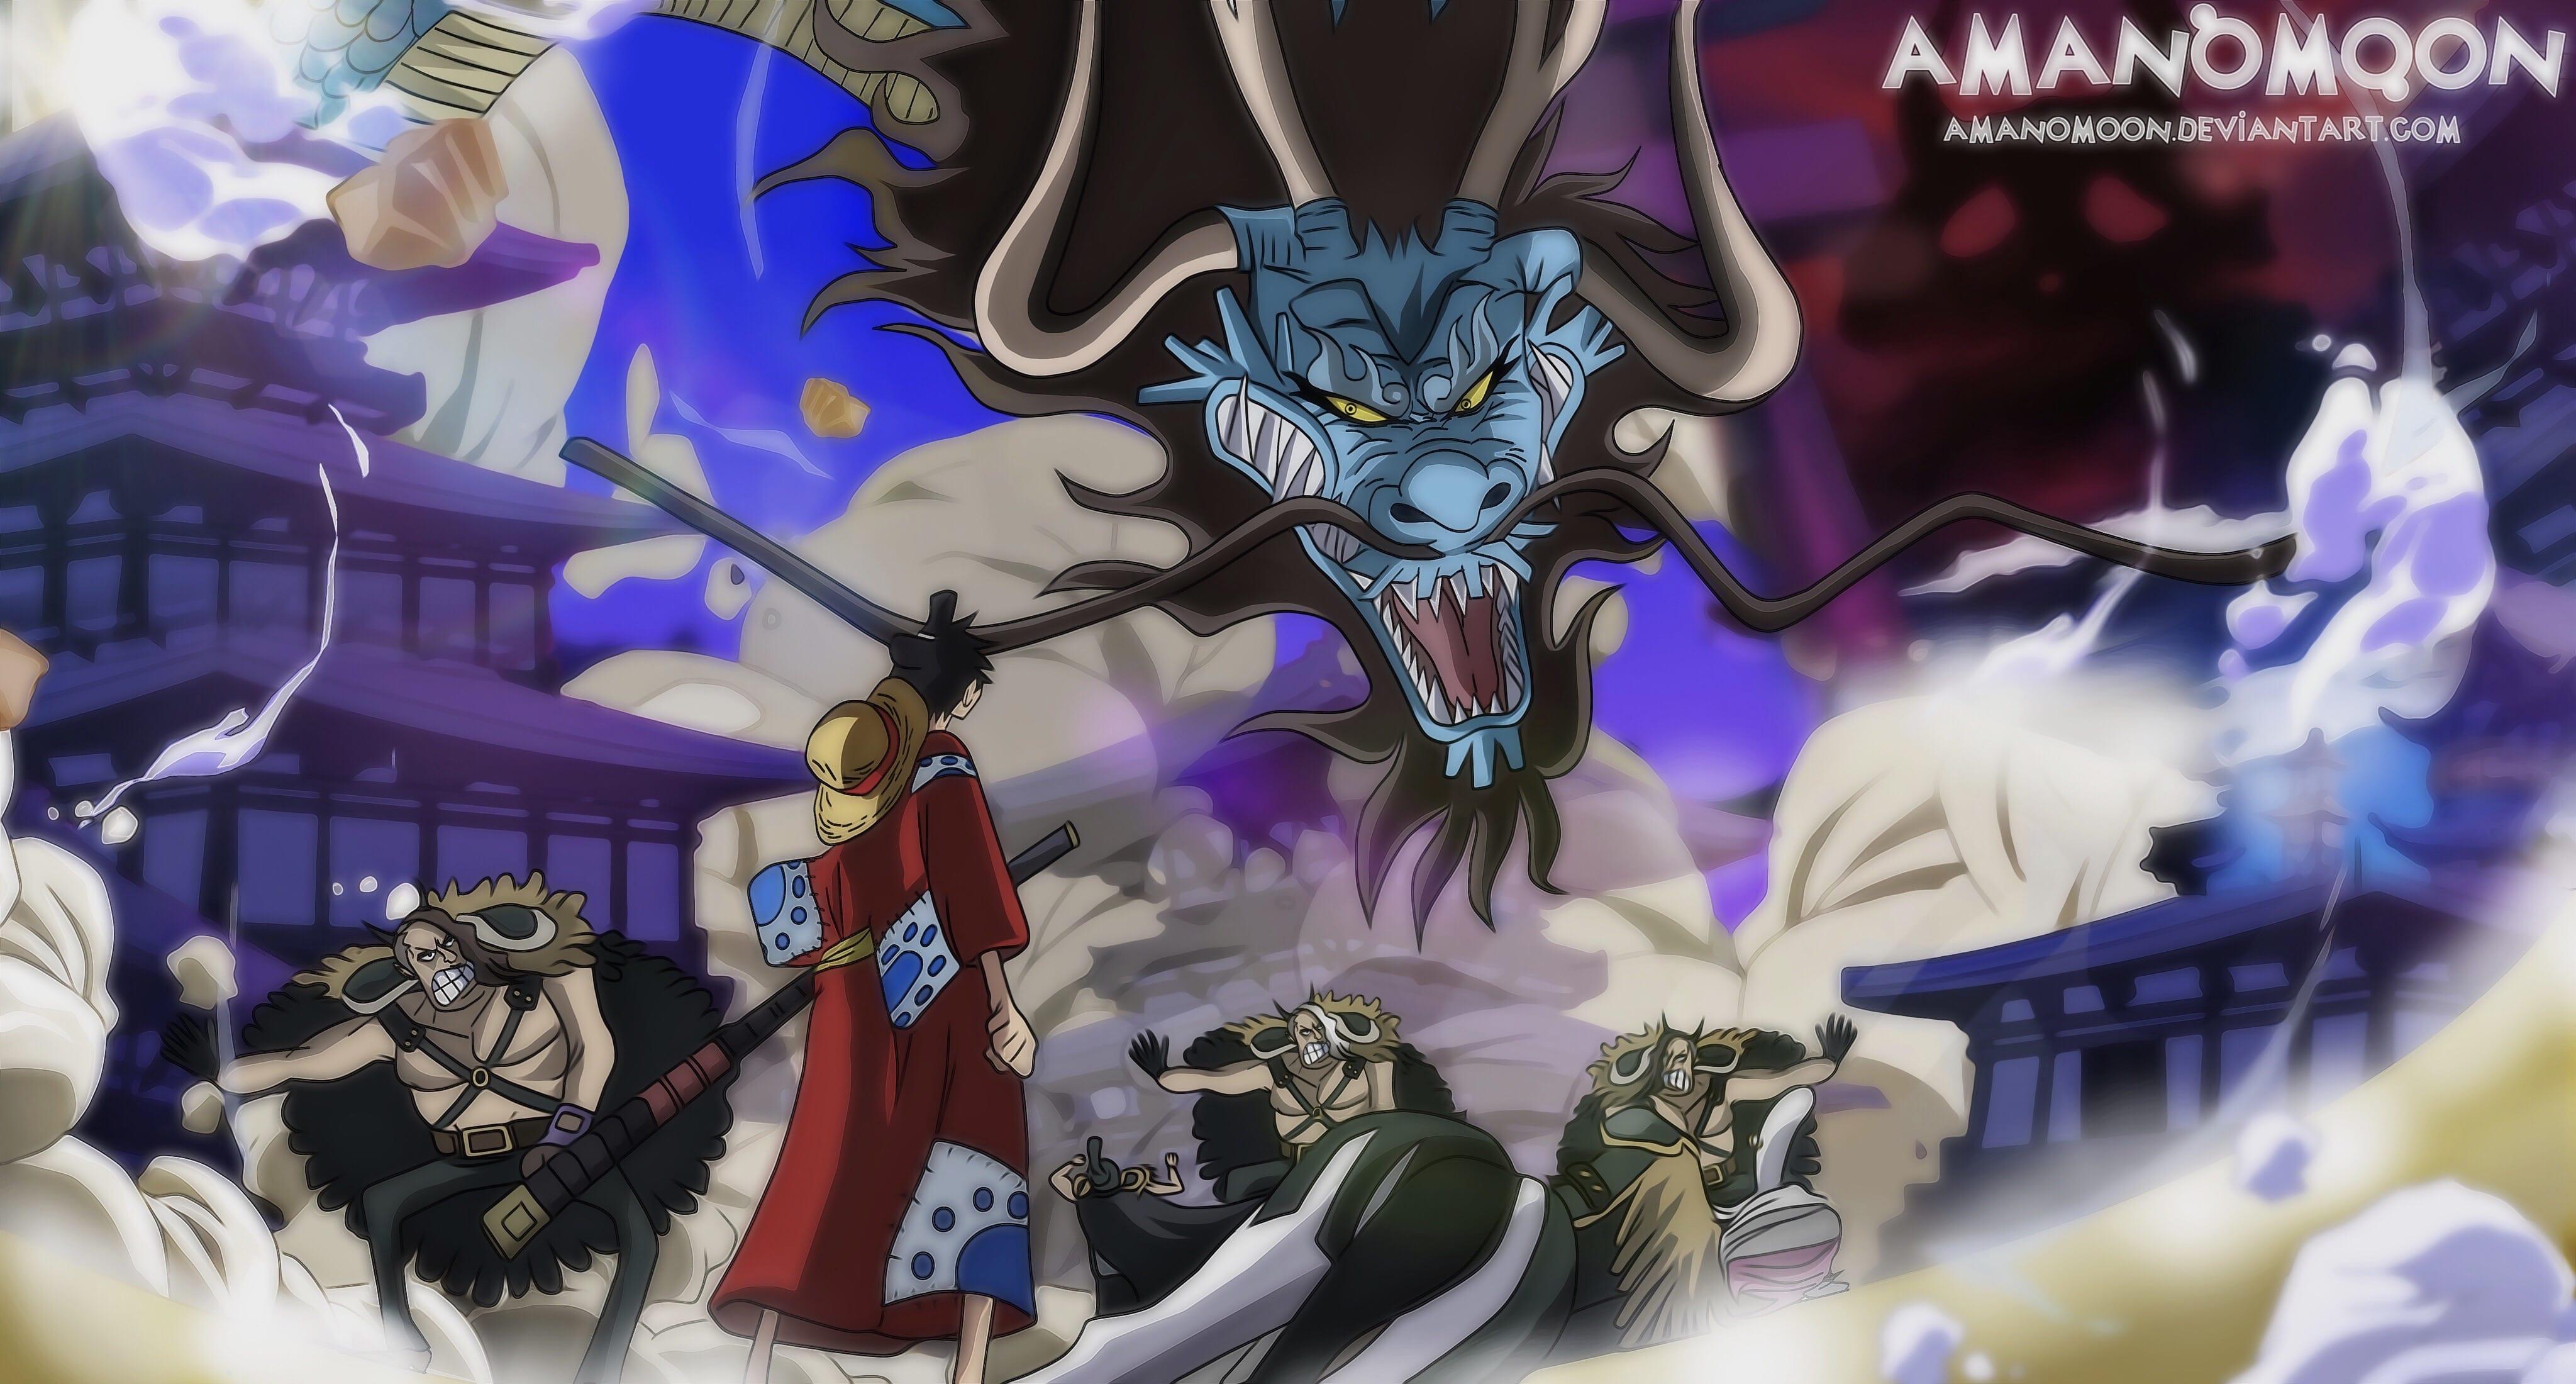 One Piece Luffy vs Kaido Wano Country Episode